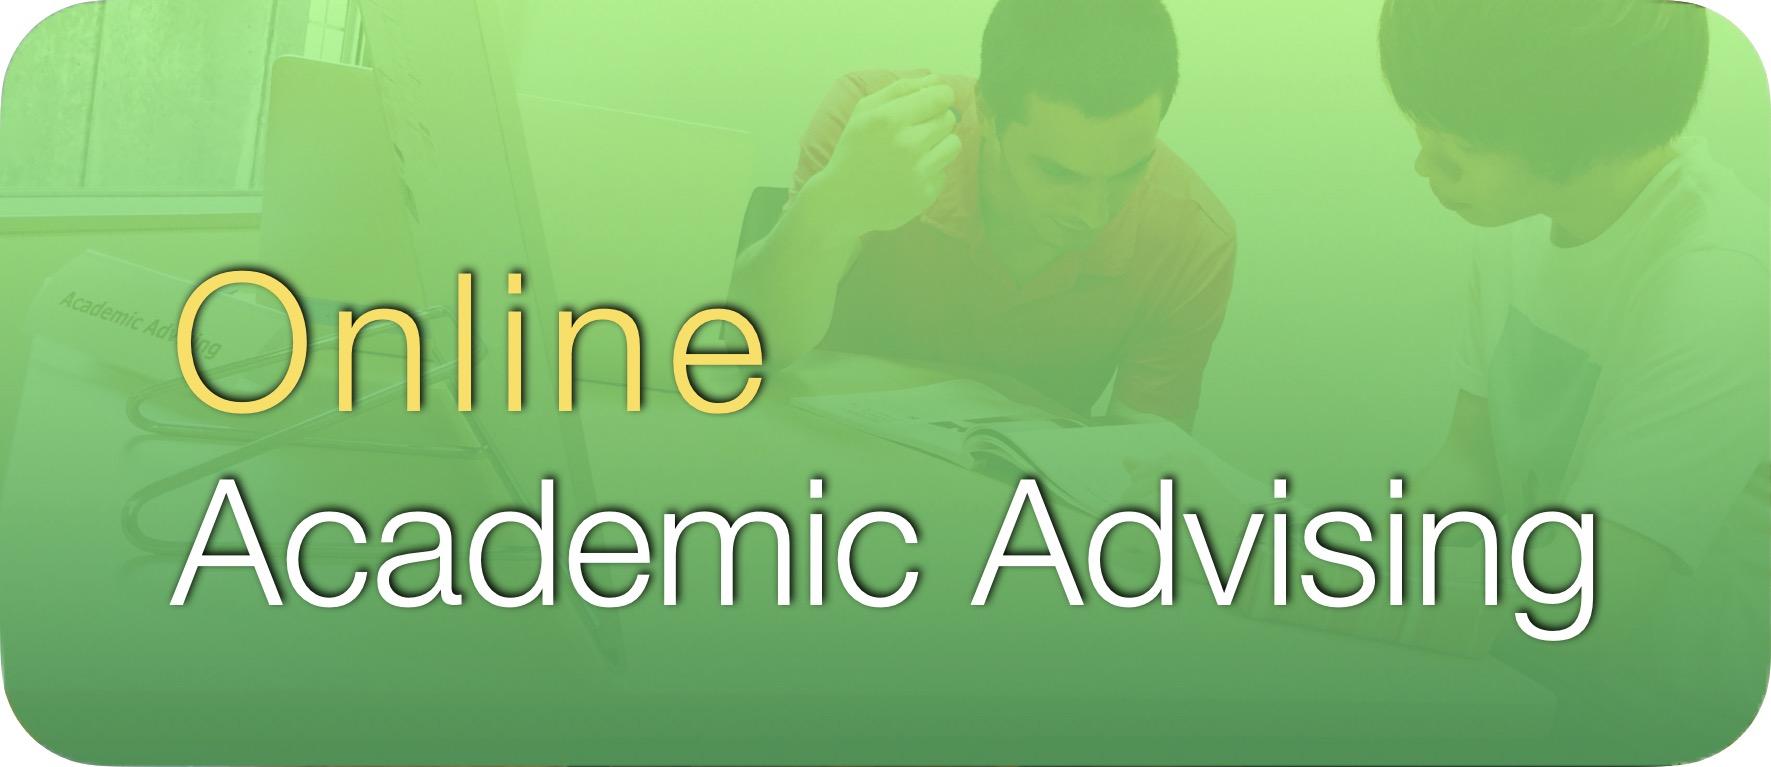 Online Academic Advising Button 2020